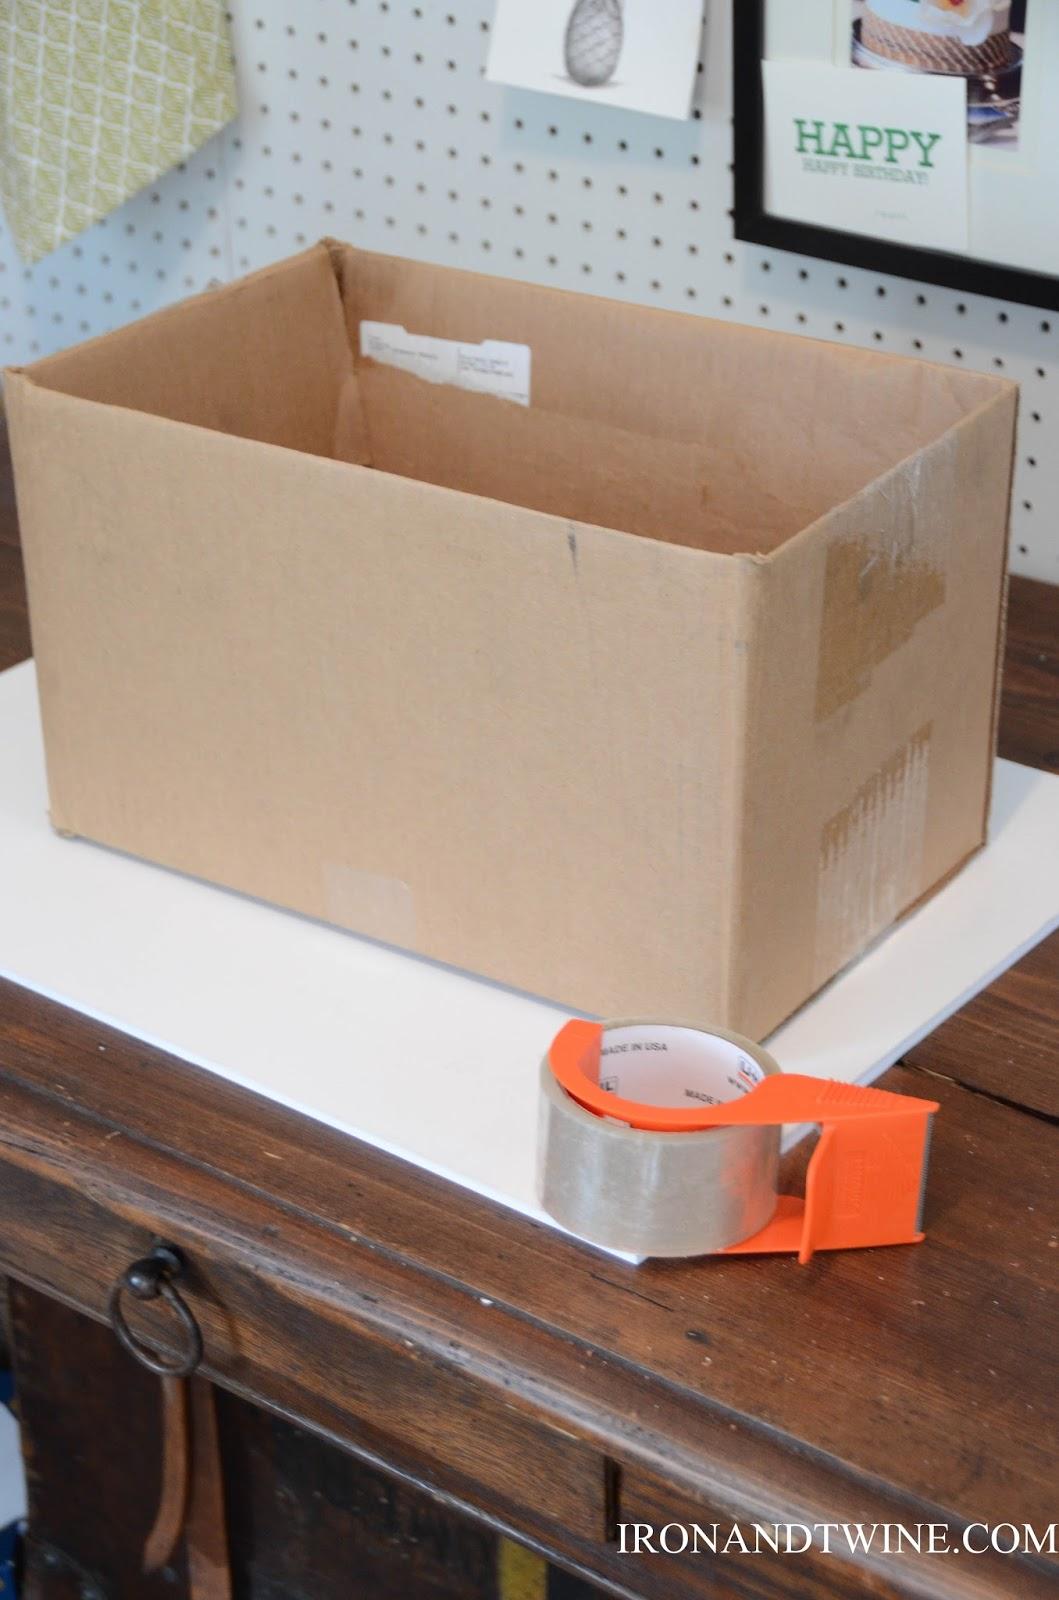 DIY+Belt+Handled+Box,+DIY+fabric+covered+box,+Iron+and+Twine+(11).jpg